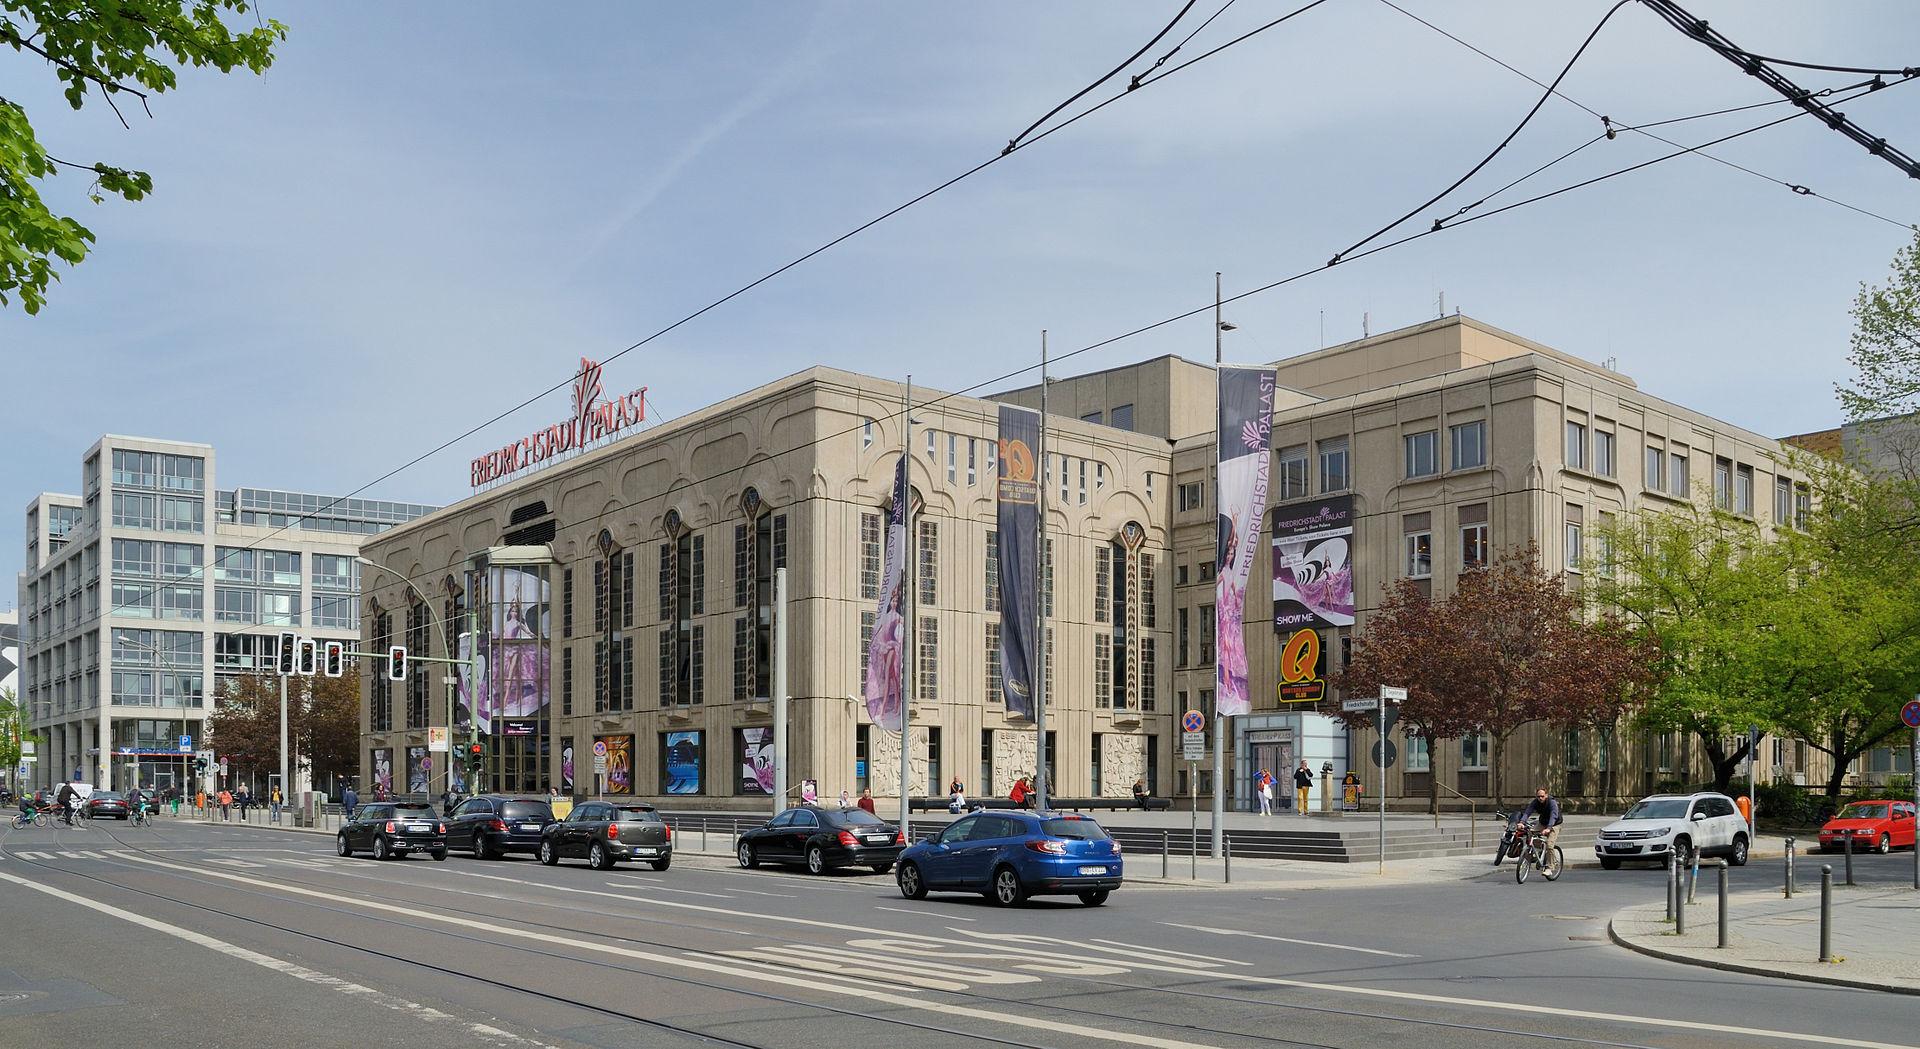 Bild Friedrichstadtpalast